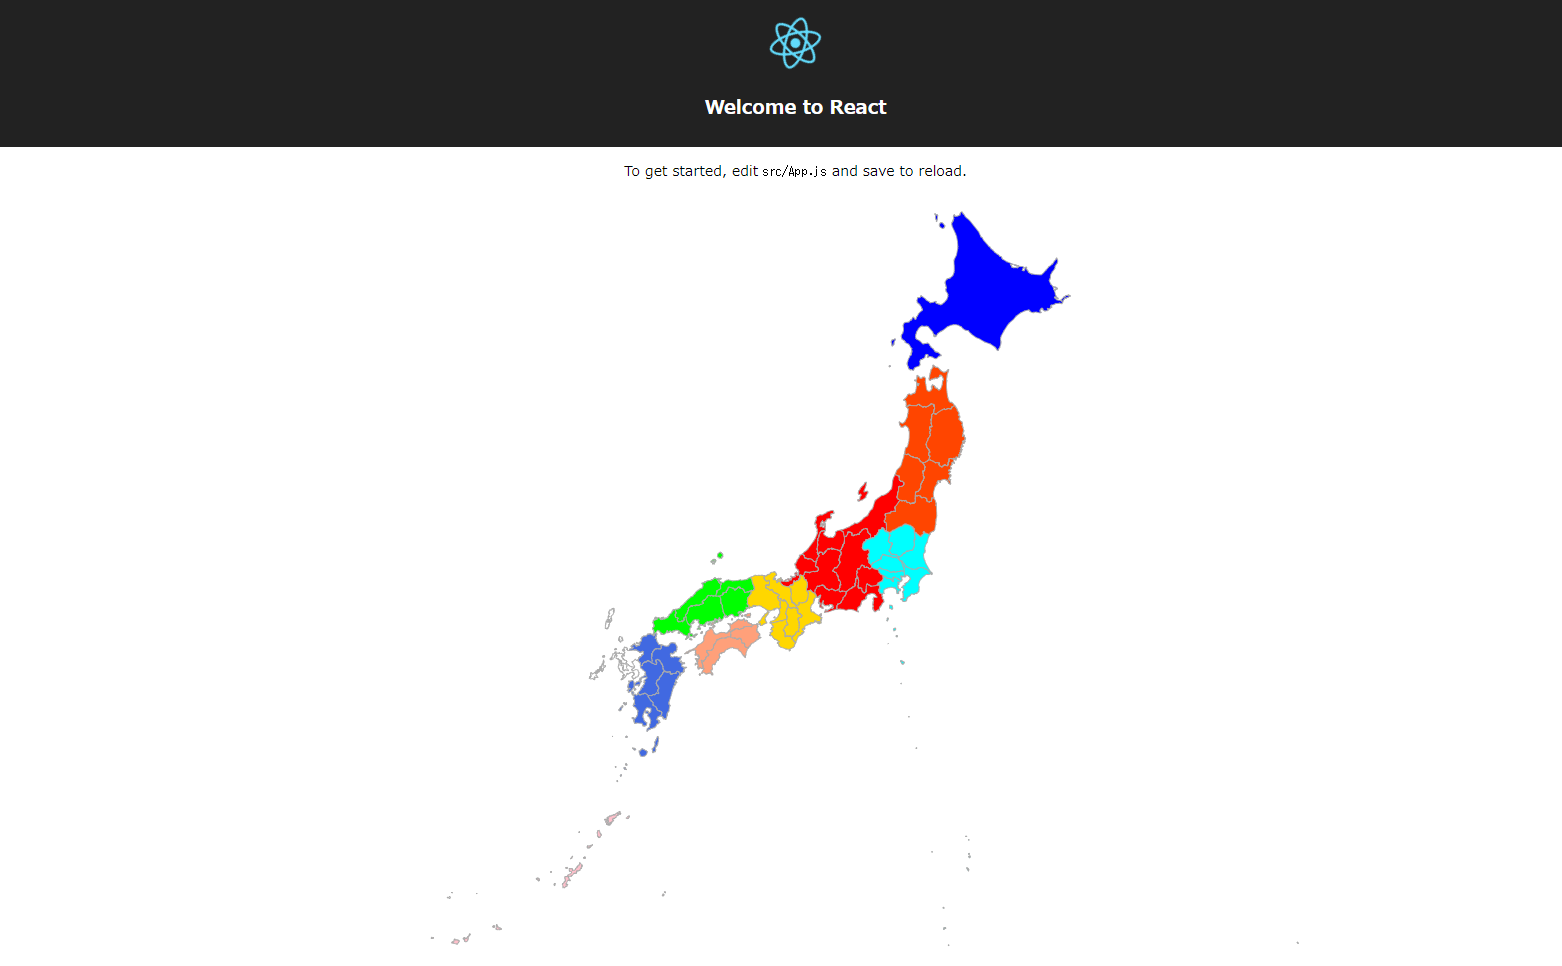 react_region_color.png